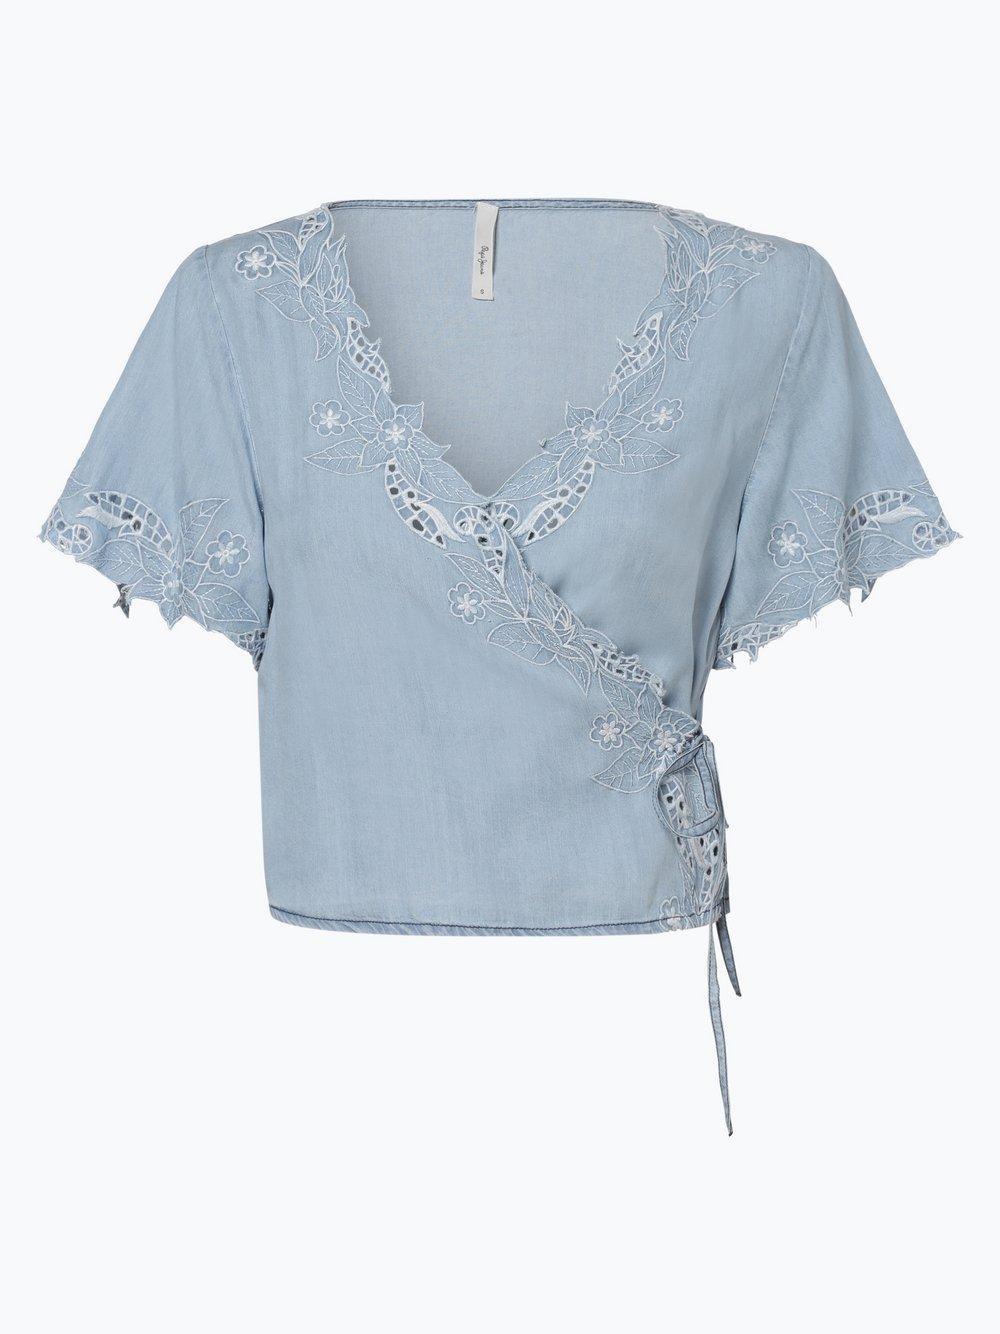 Pepe Jeans - Damska koszula jeansowa – Xenia, niebieski